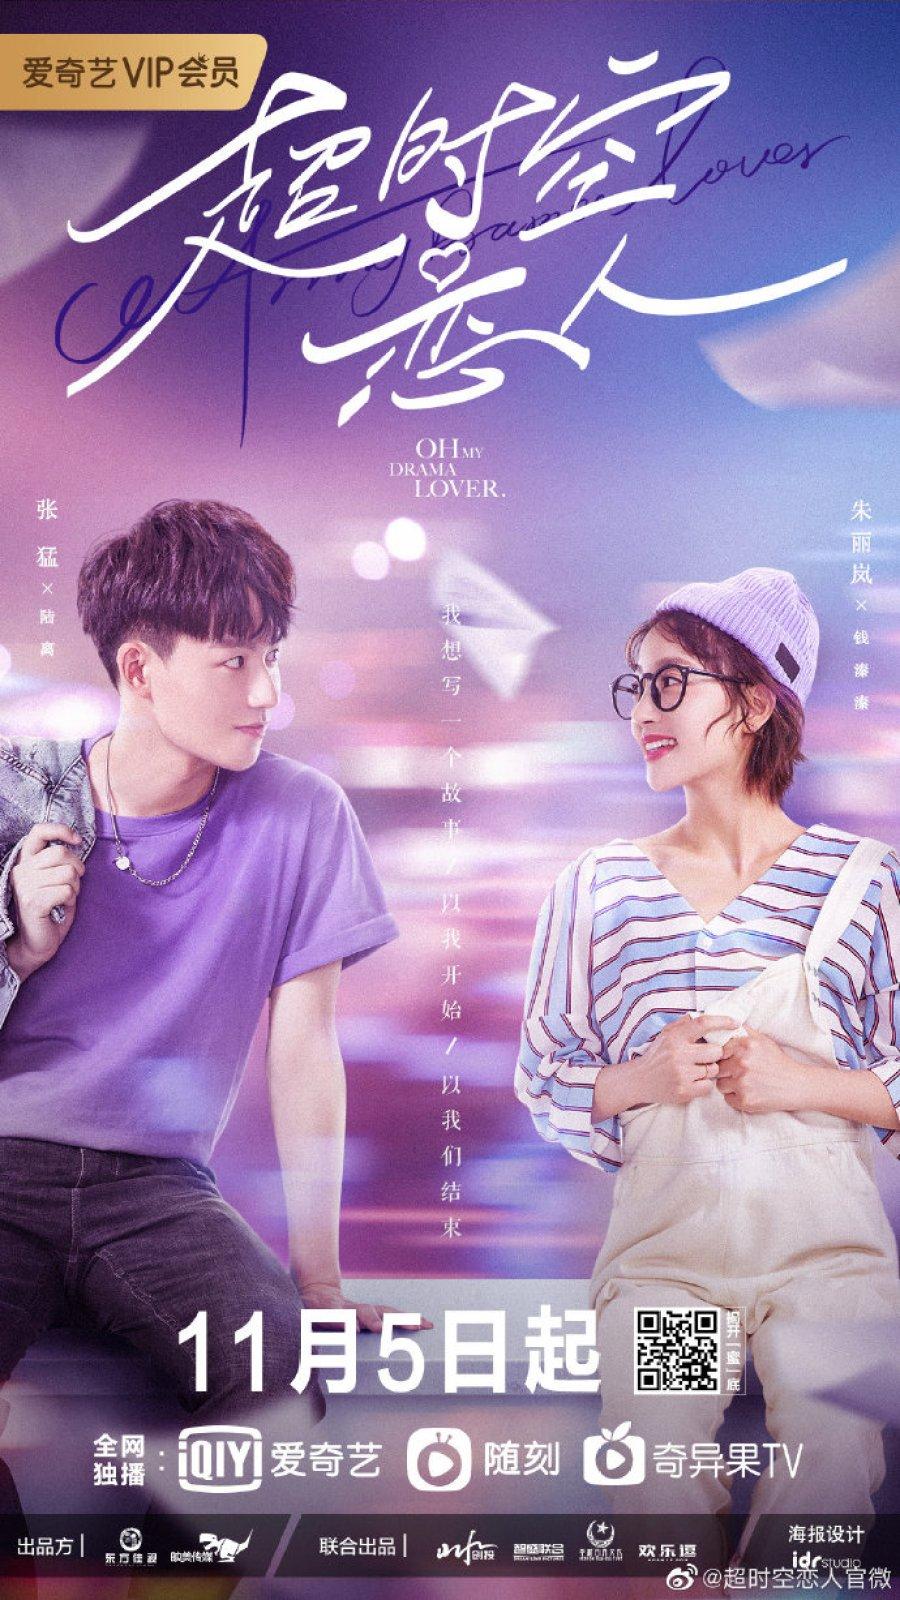 Oh My Drama Lover (2020) โลกสองใบของยัยนักเขียน ซับไทย EP1 – EP24